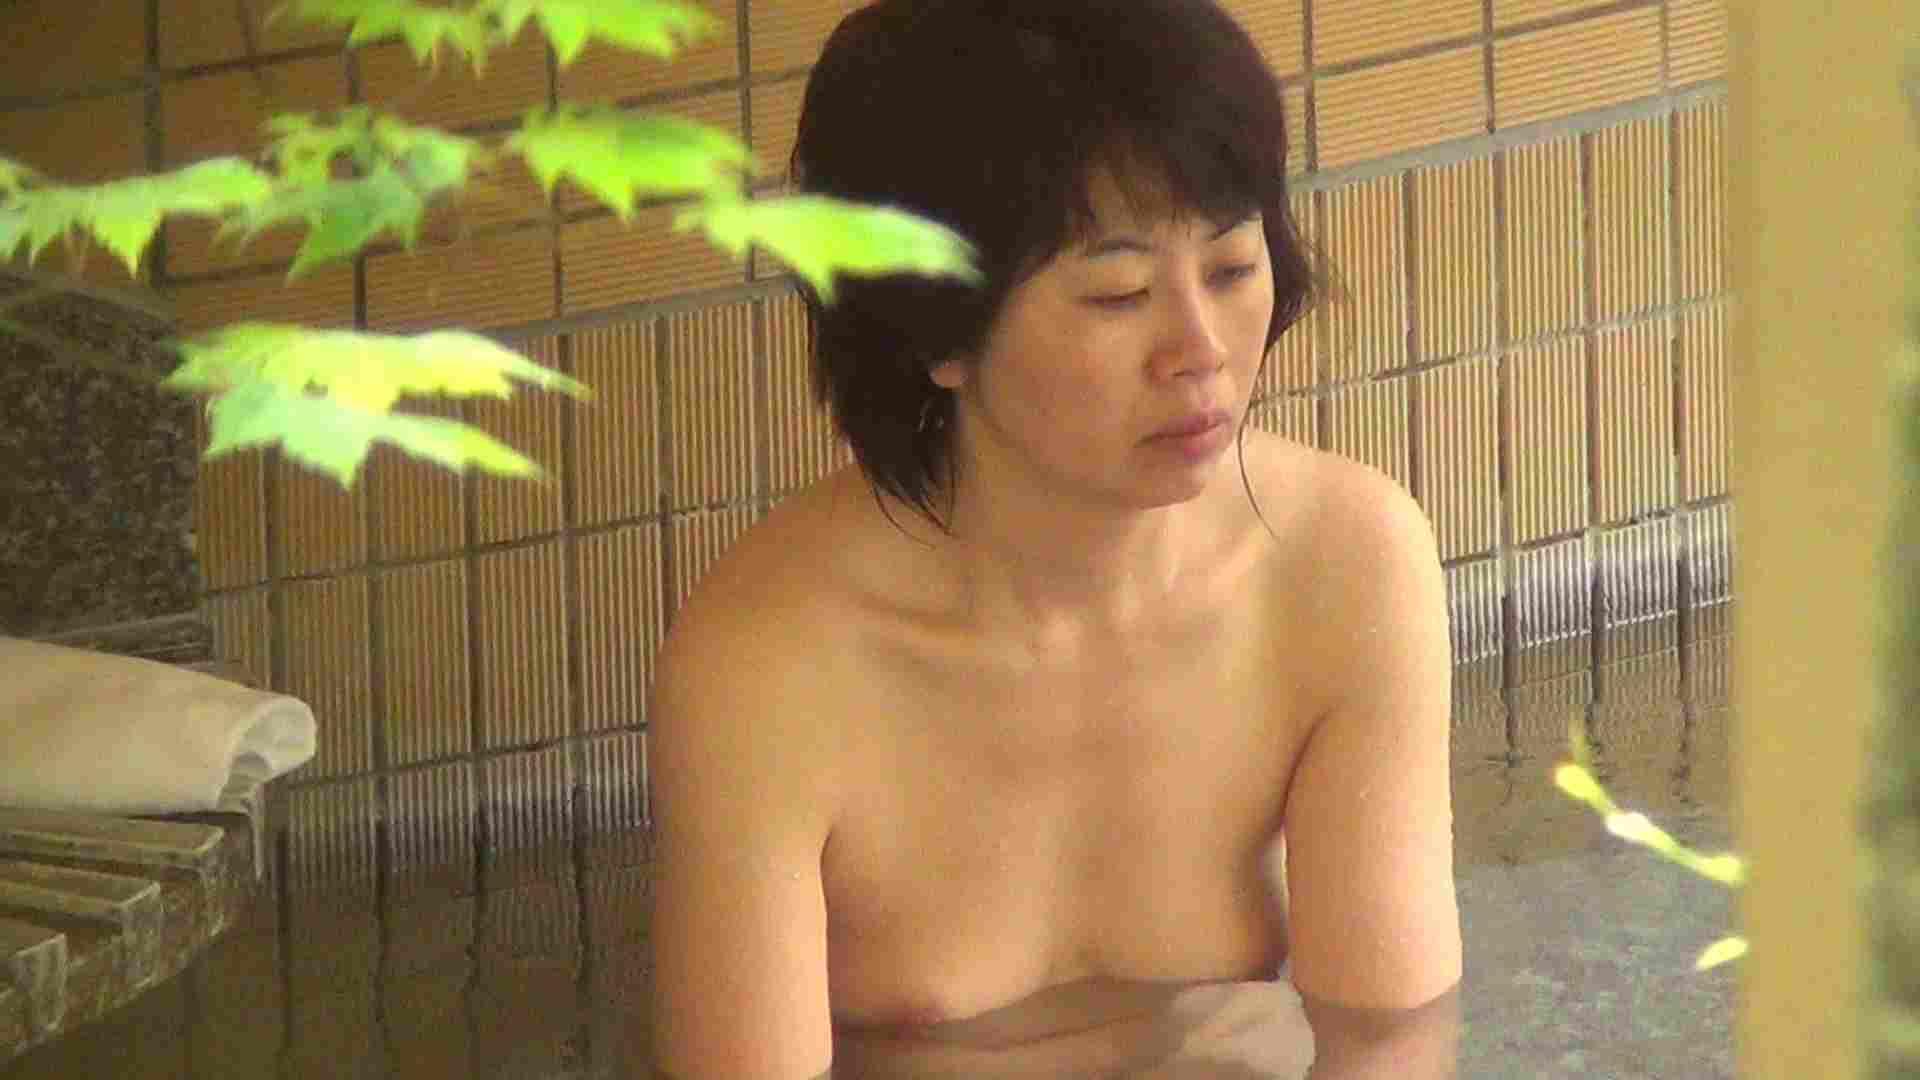 Aquaな露天風呂Vol.247 盗撮   OLセックス  106画像 49